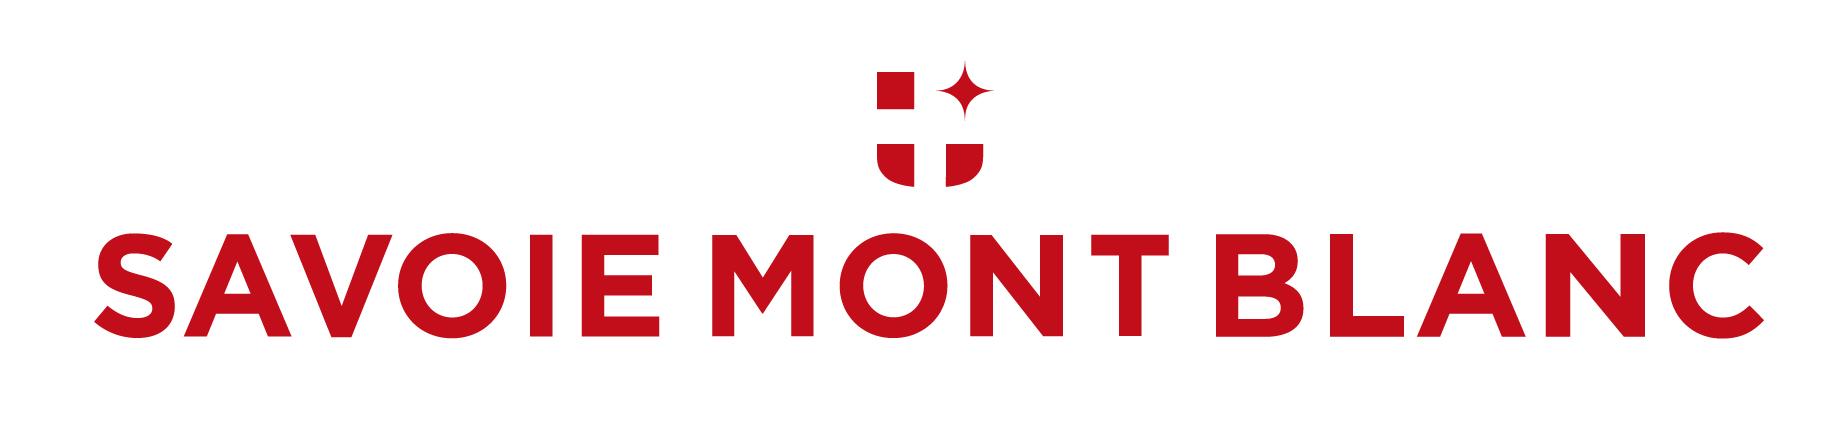 Logo Savoie Mont Blanc - bandeau.jpg